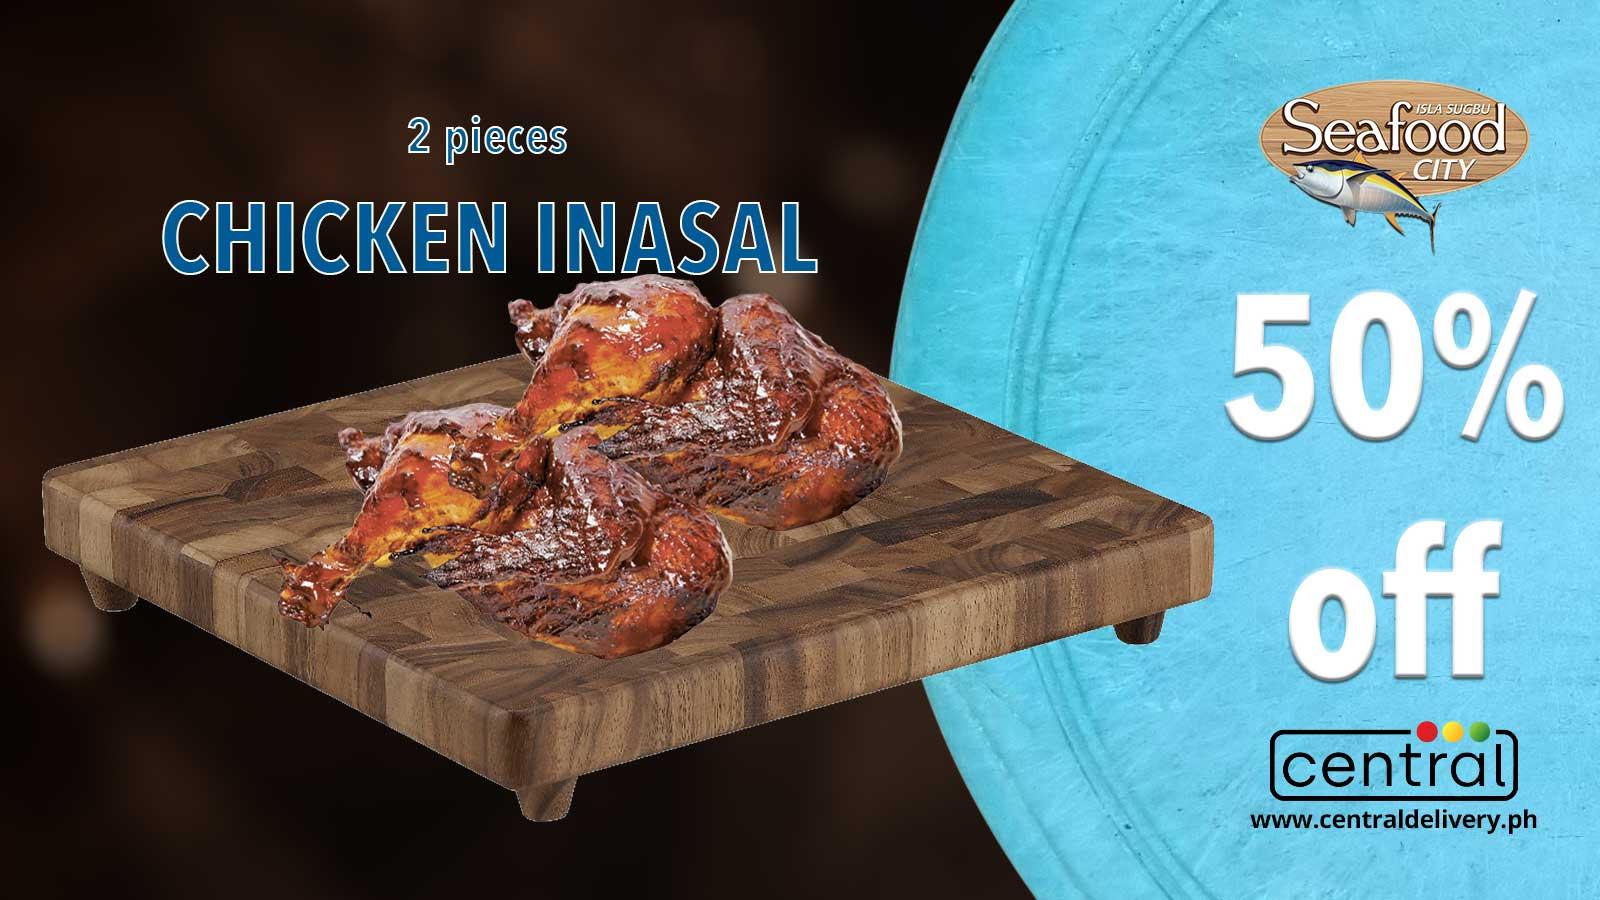 Enjoy 50% off Isla Sugbu Seafood City's Chicken Inasal